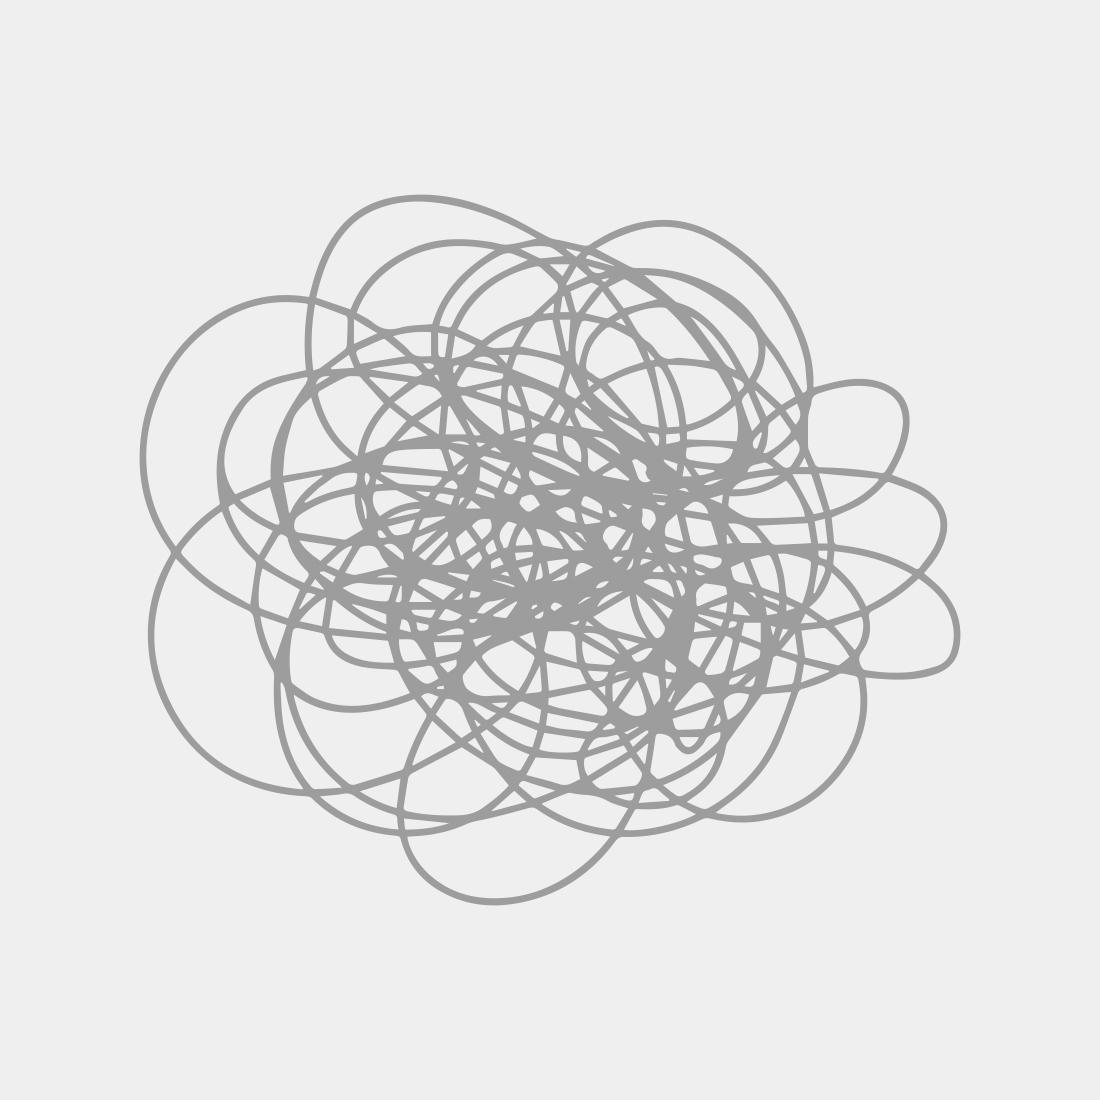 Albert Irvin OBE RA Untitled opus w.8 (framed)